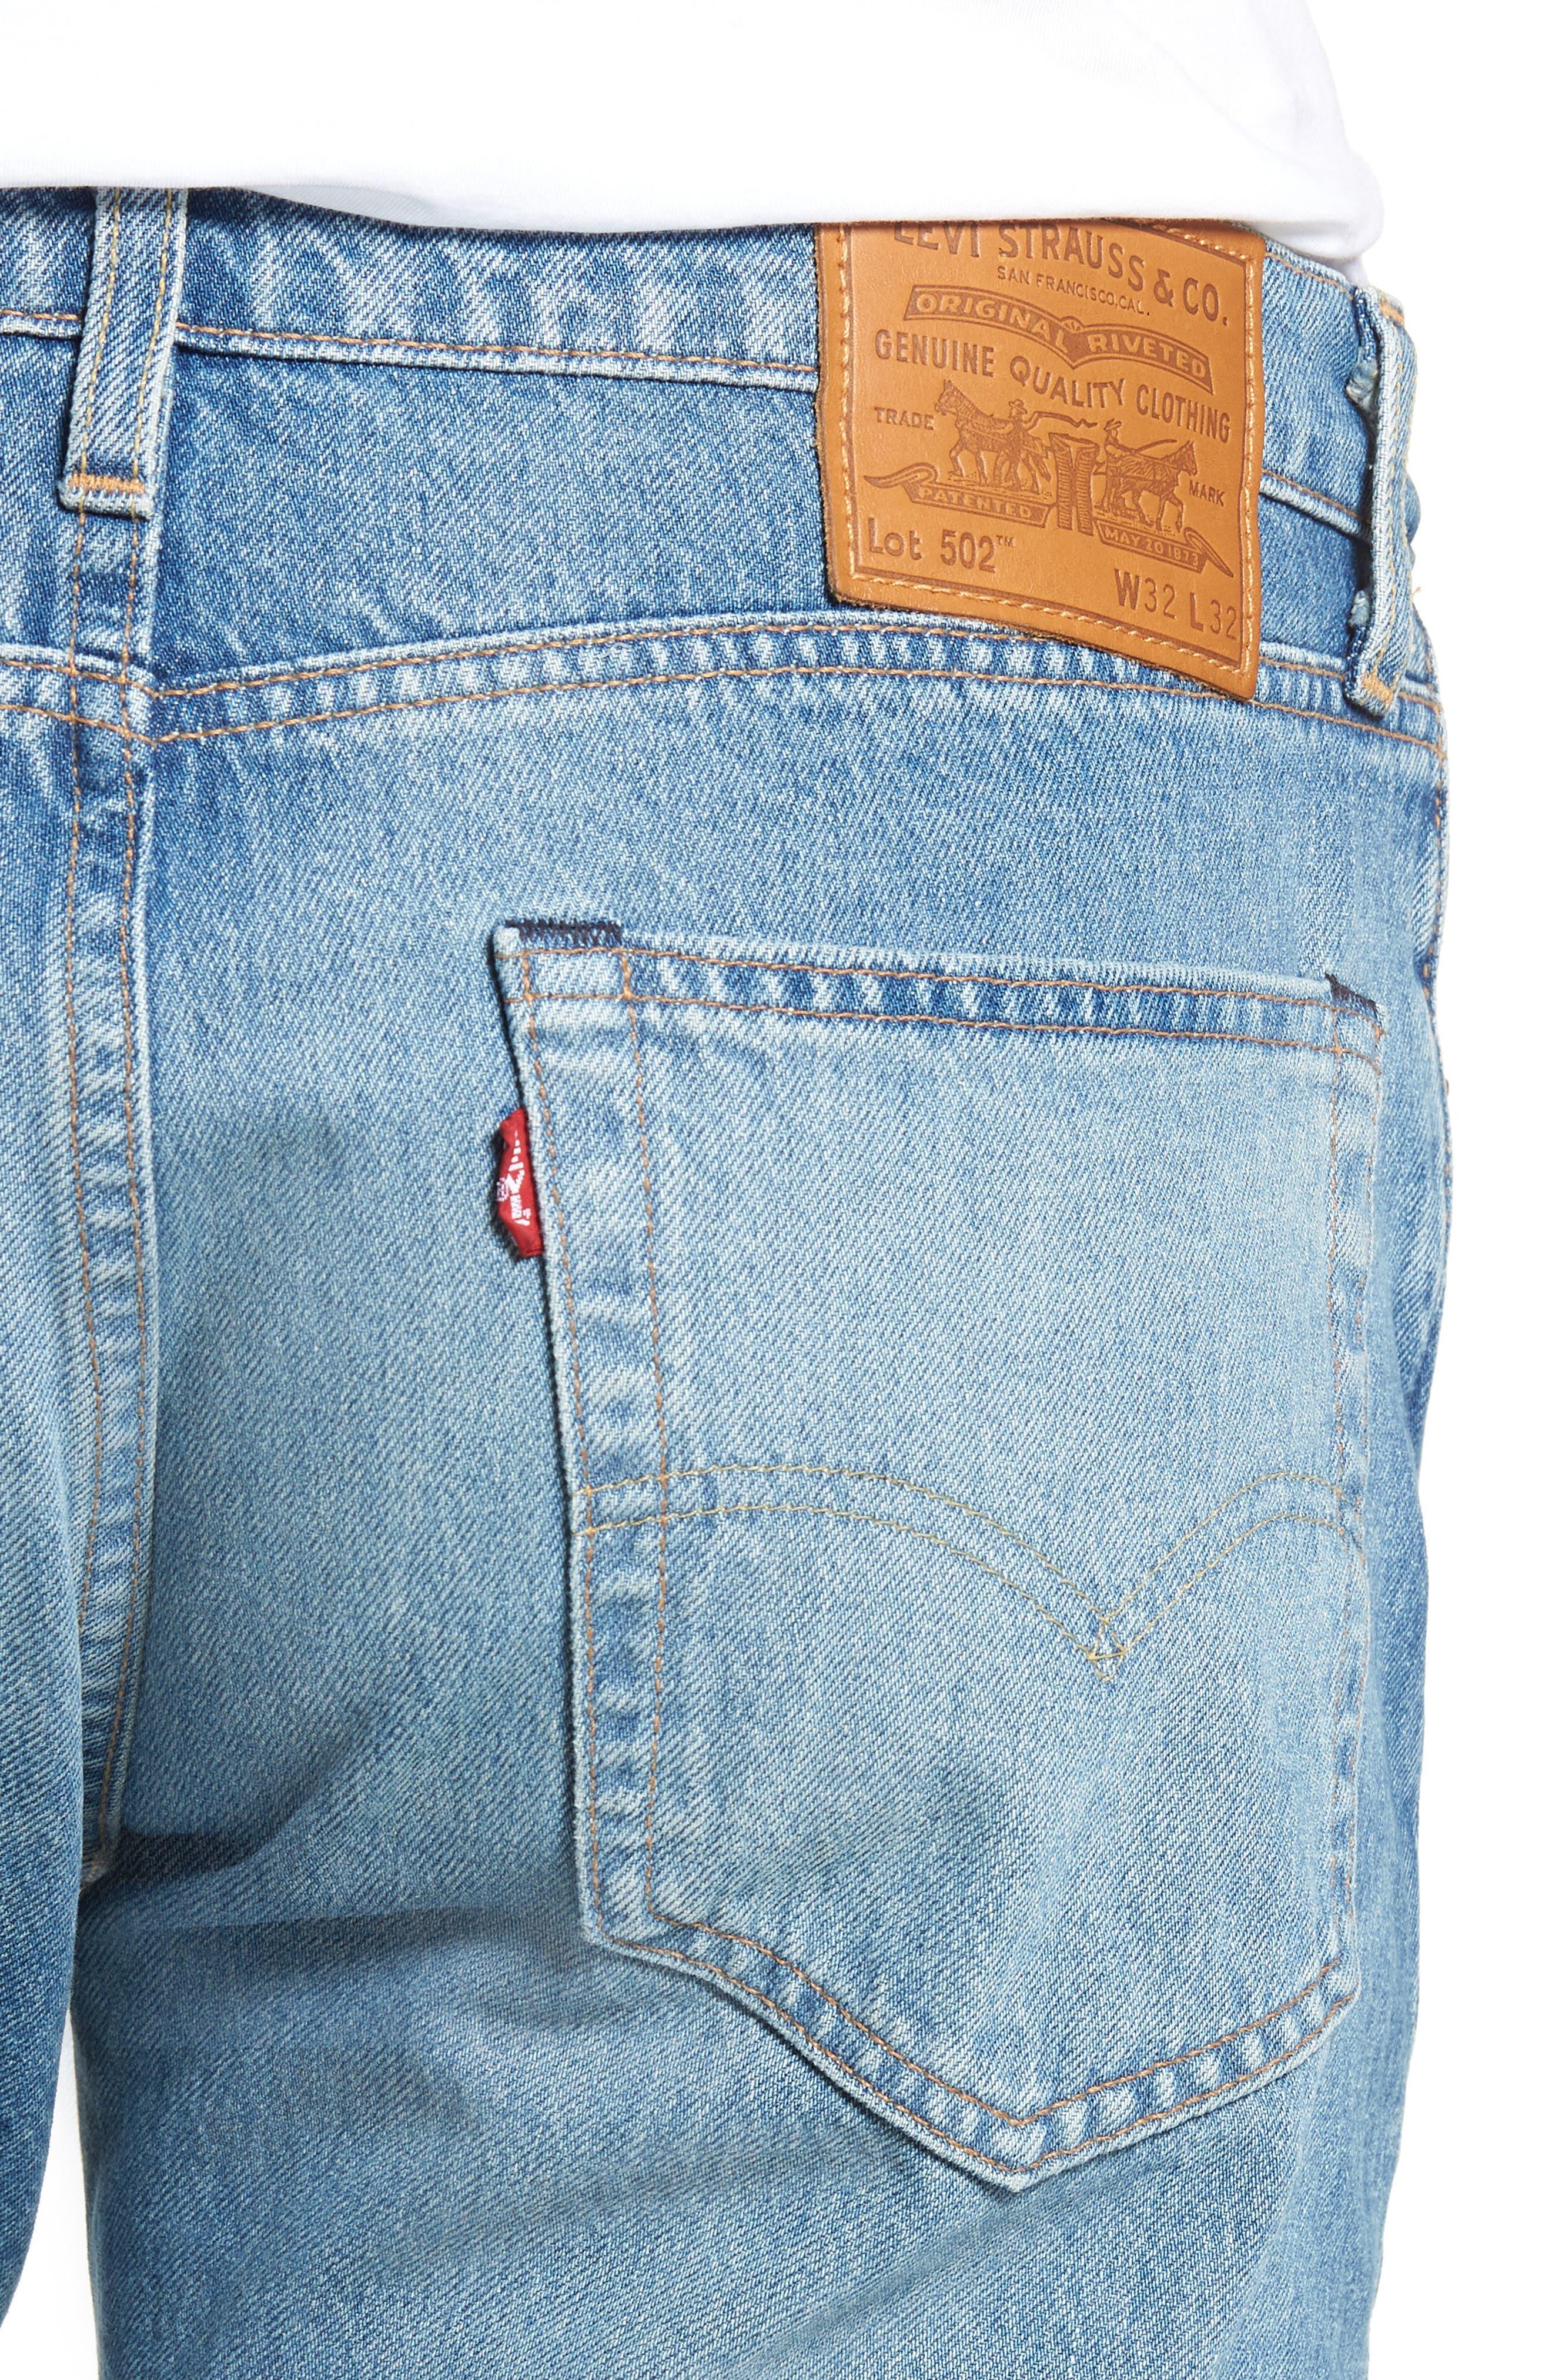 502<sup>™</sup> Slim Fit Jeans,                             Alternate thumbnail 4, color,                             GRANDPAS WARP